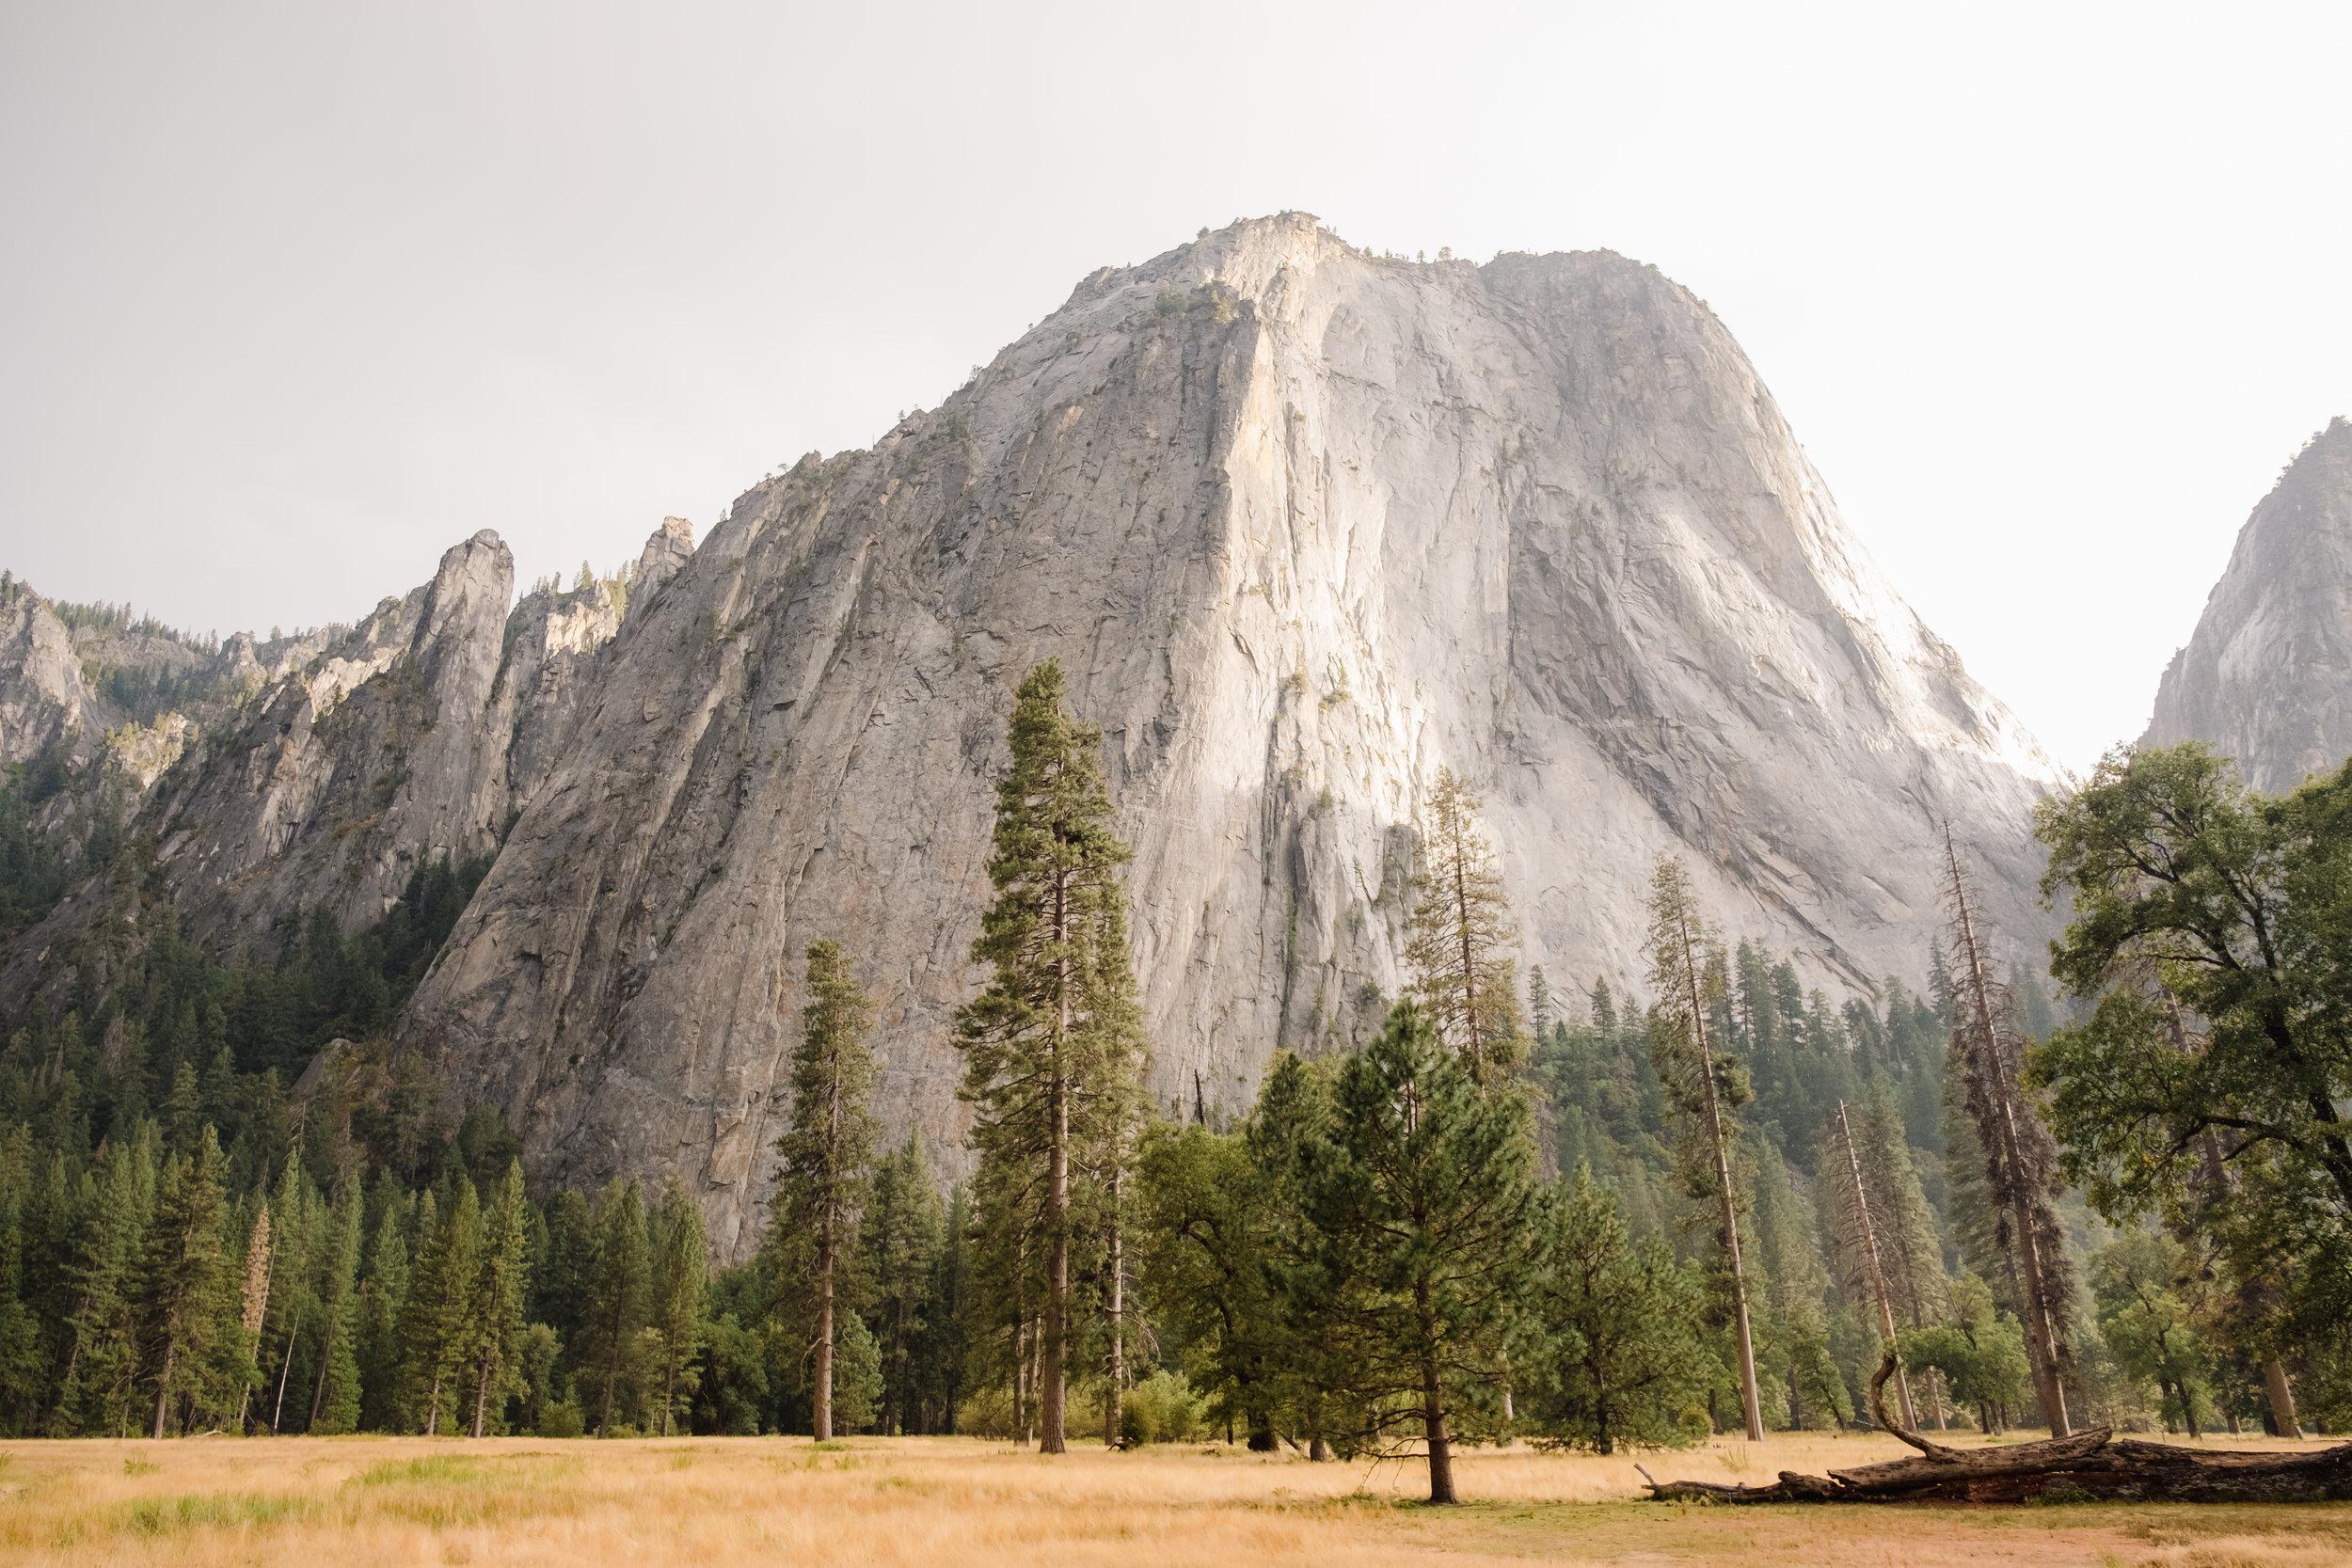 Yosemite_National_Park1.jpg